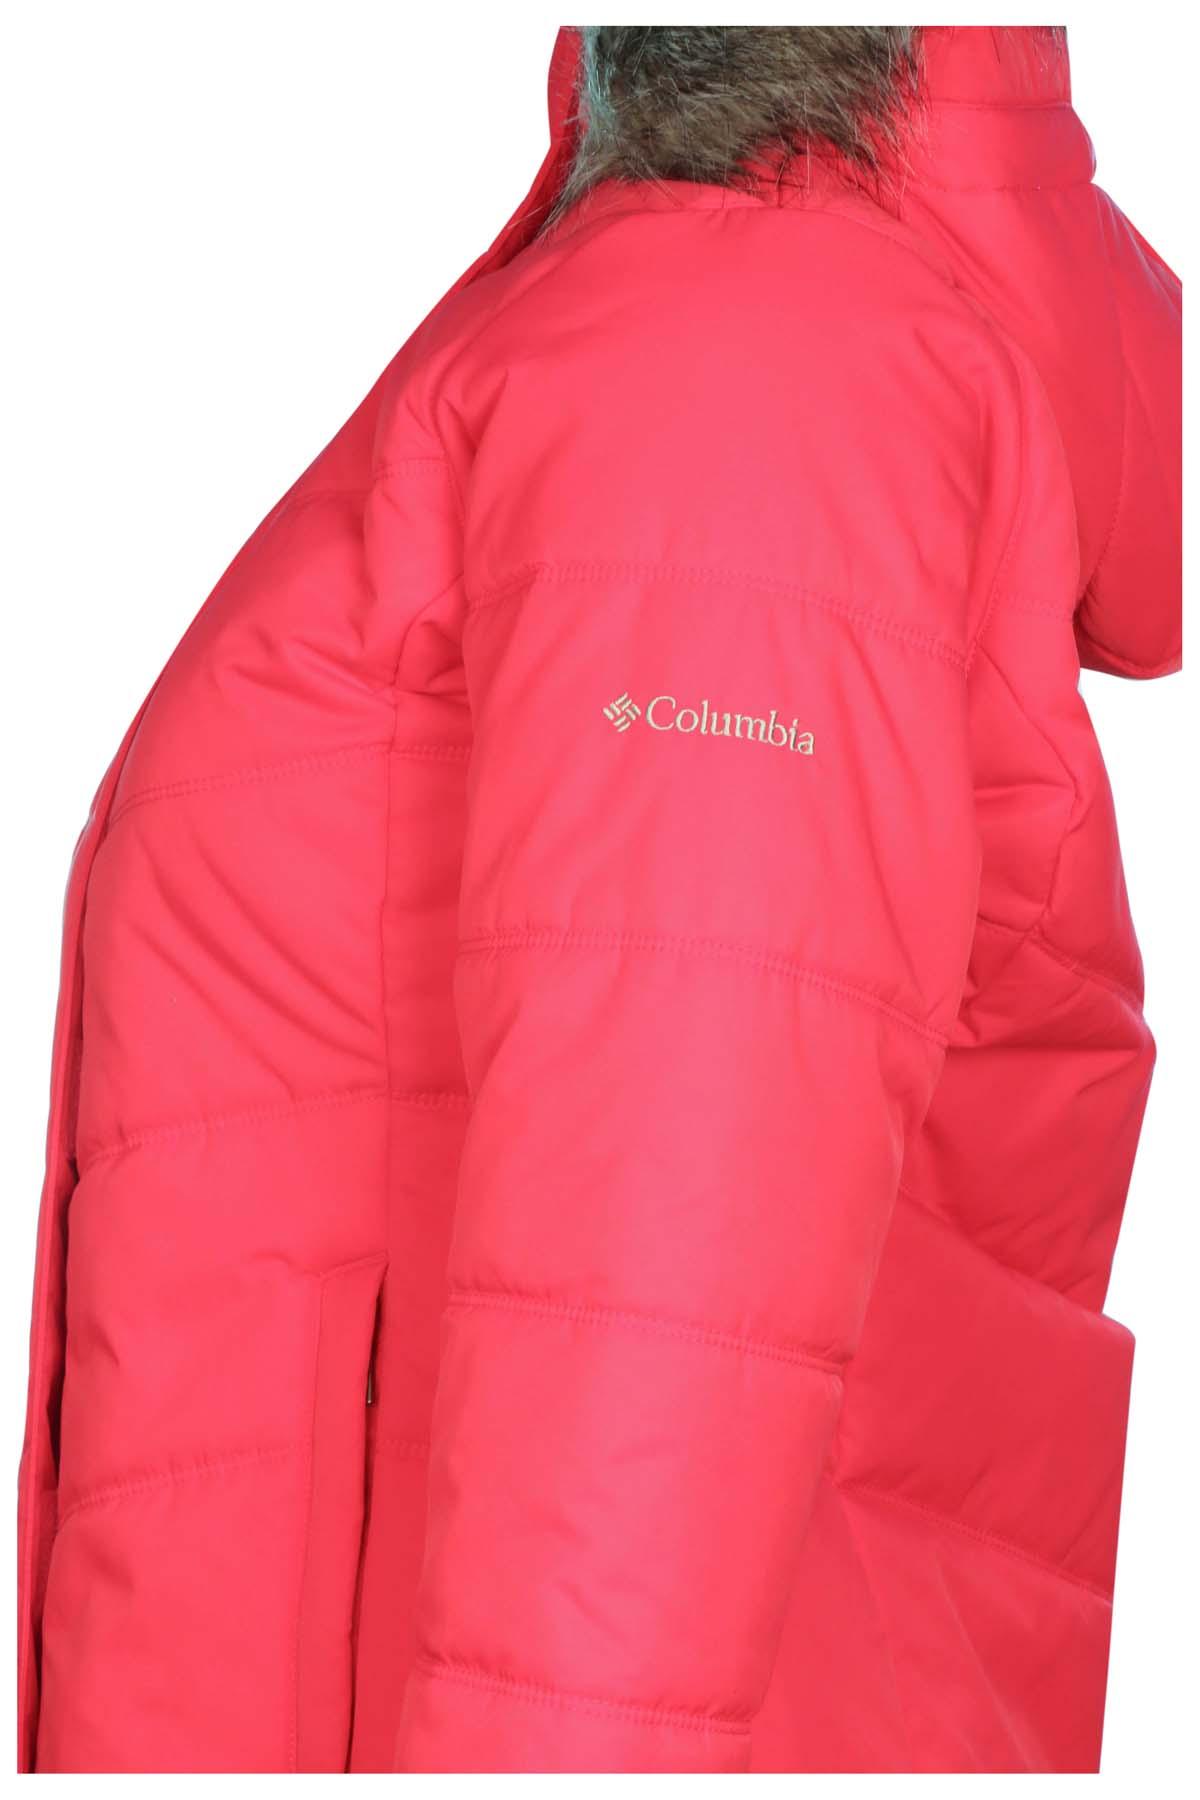 Columbia Women S Simply Snowy Ii Insulated Jacket Ebay